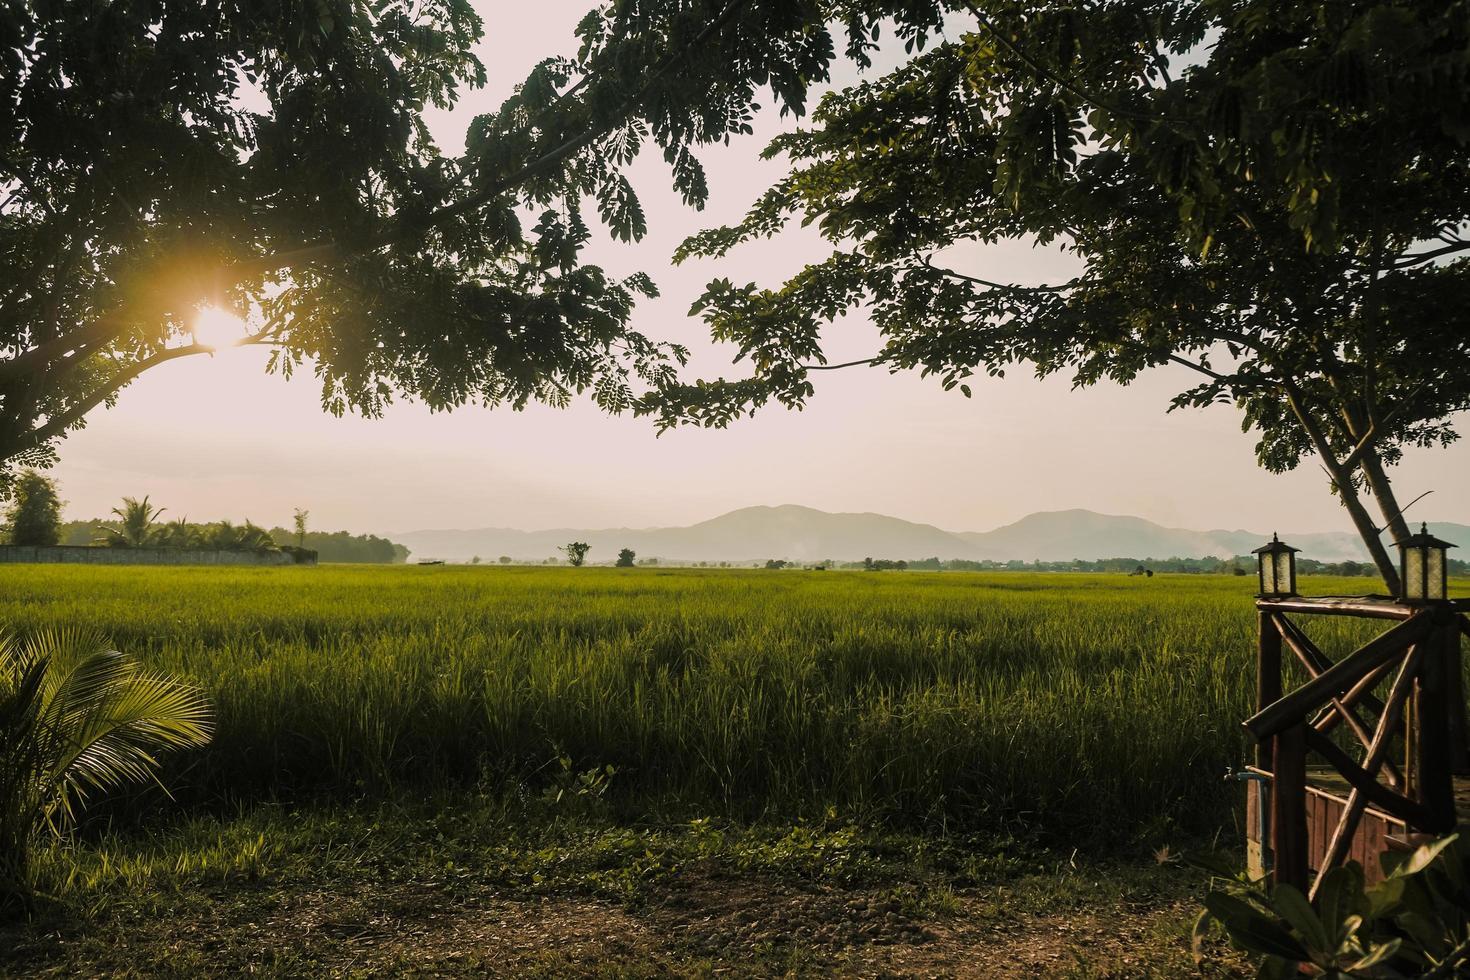 zonsondergang op het groene rijst veld in platteland foto